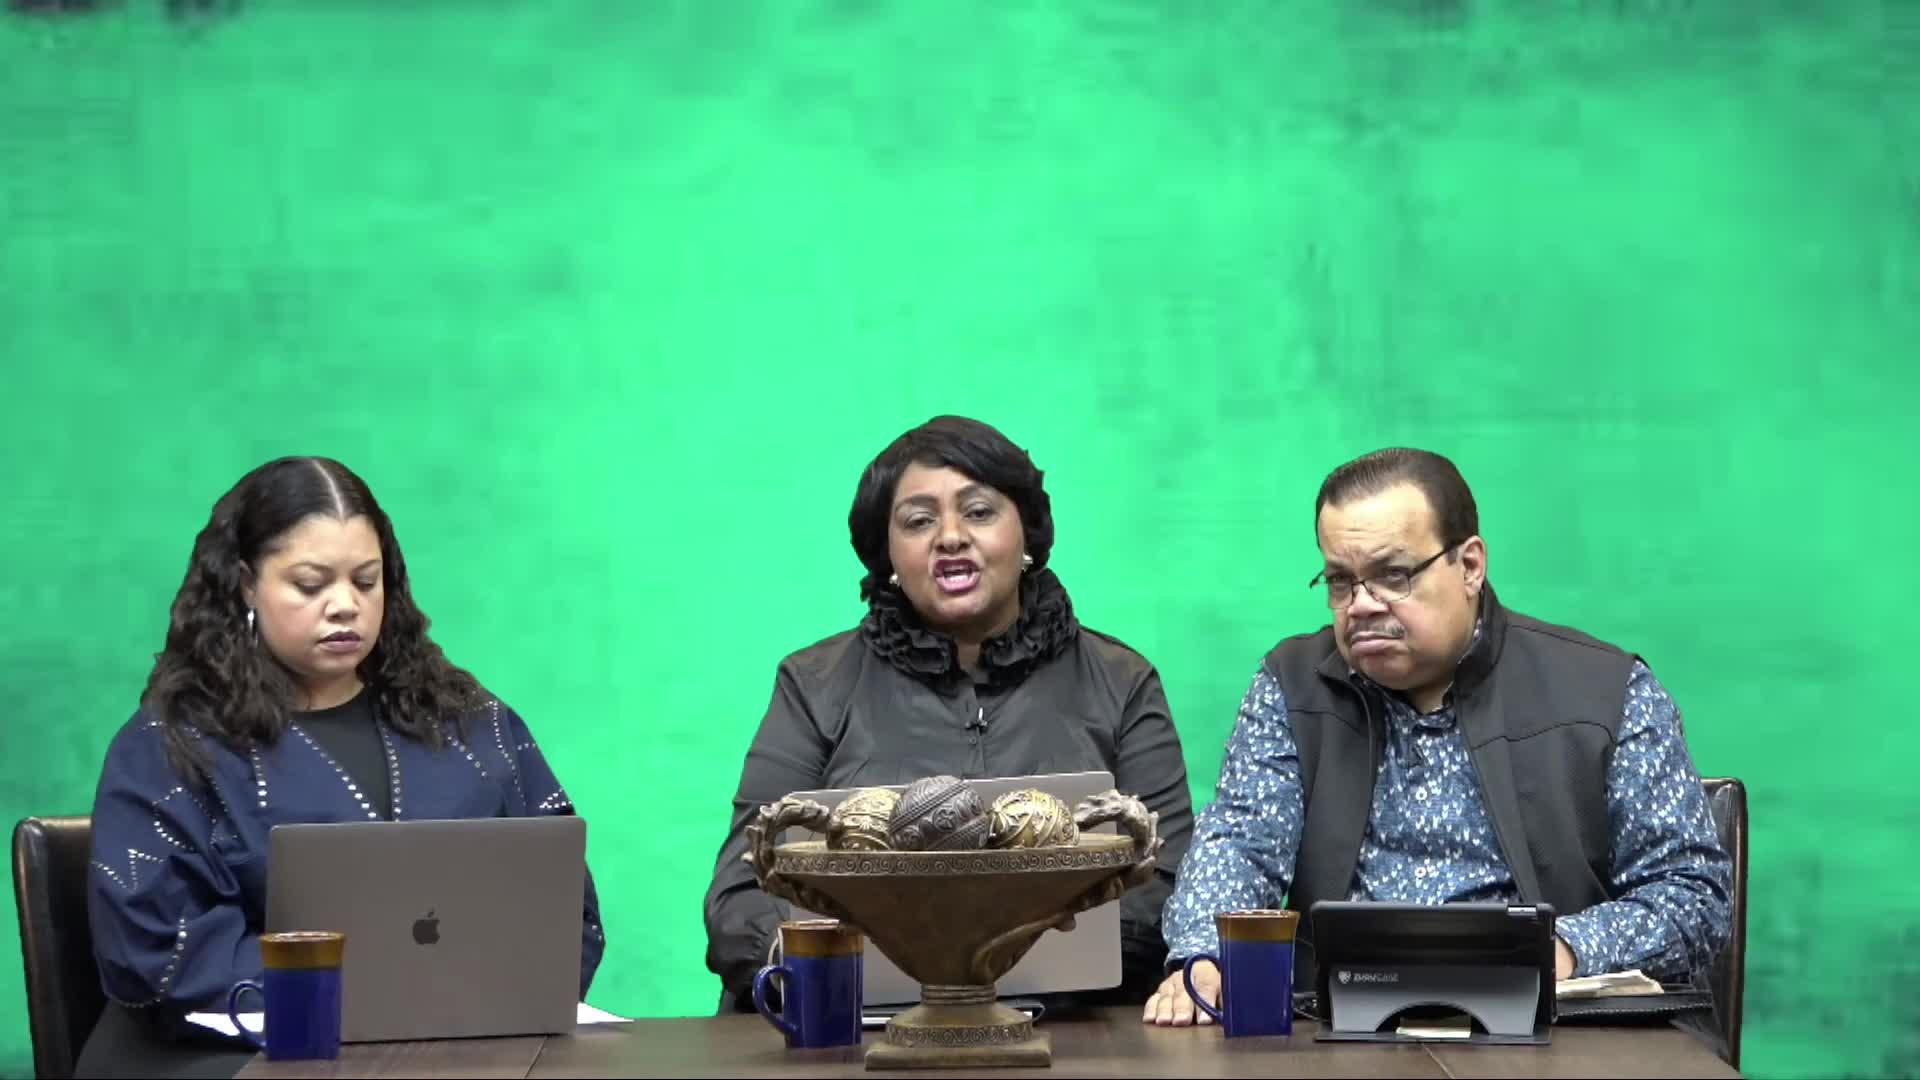 Wednesday Night Live- Drs. Joseph, Marjanita & April Ripley-Wed. April 21, 2021@7:30PM